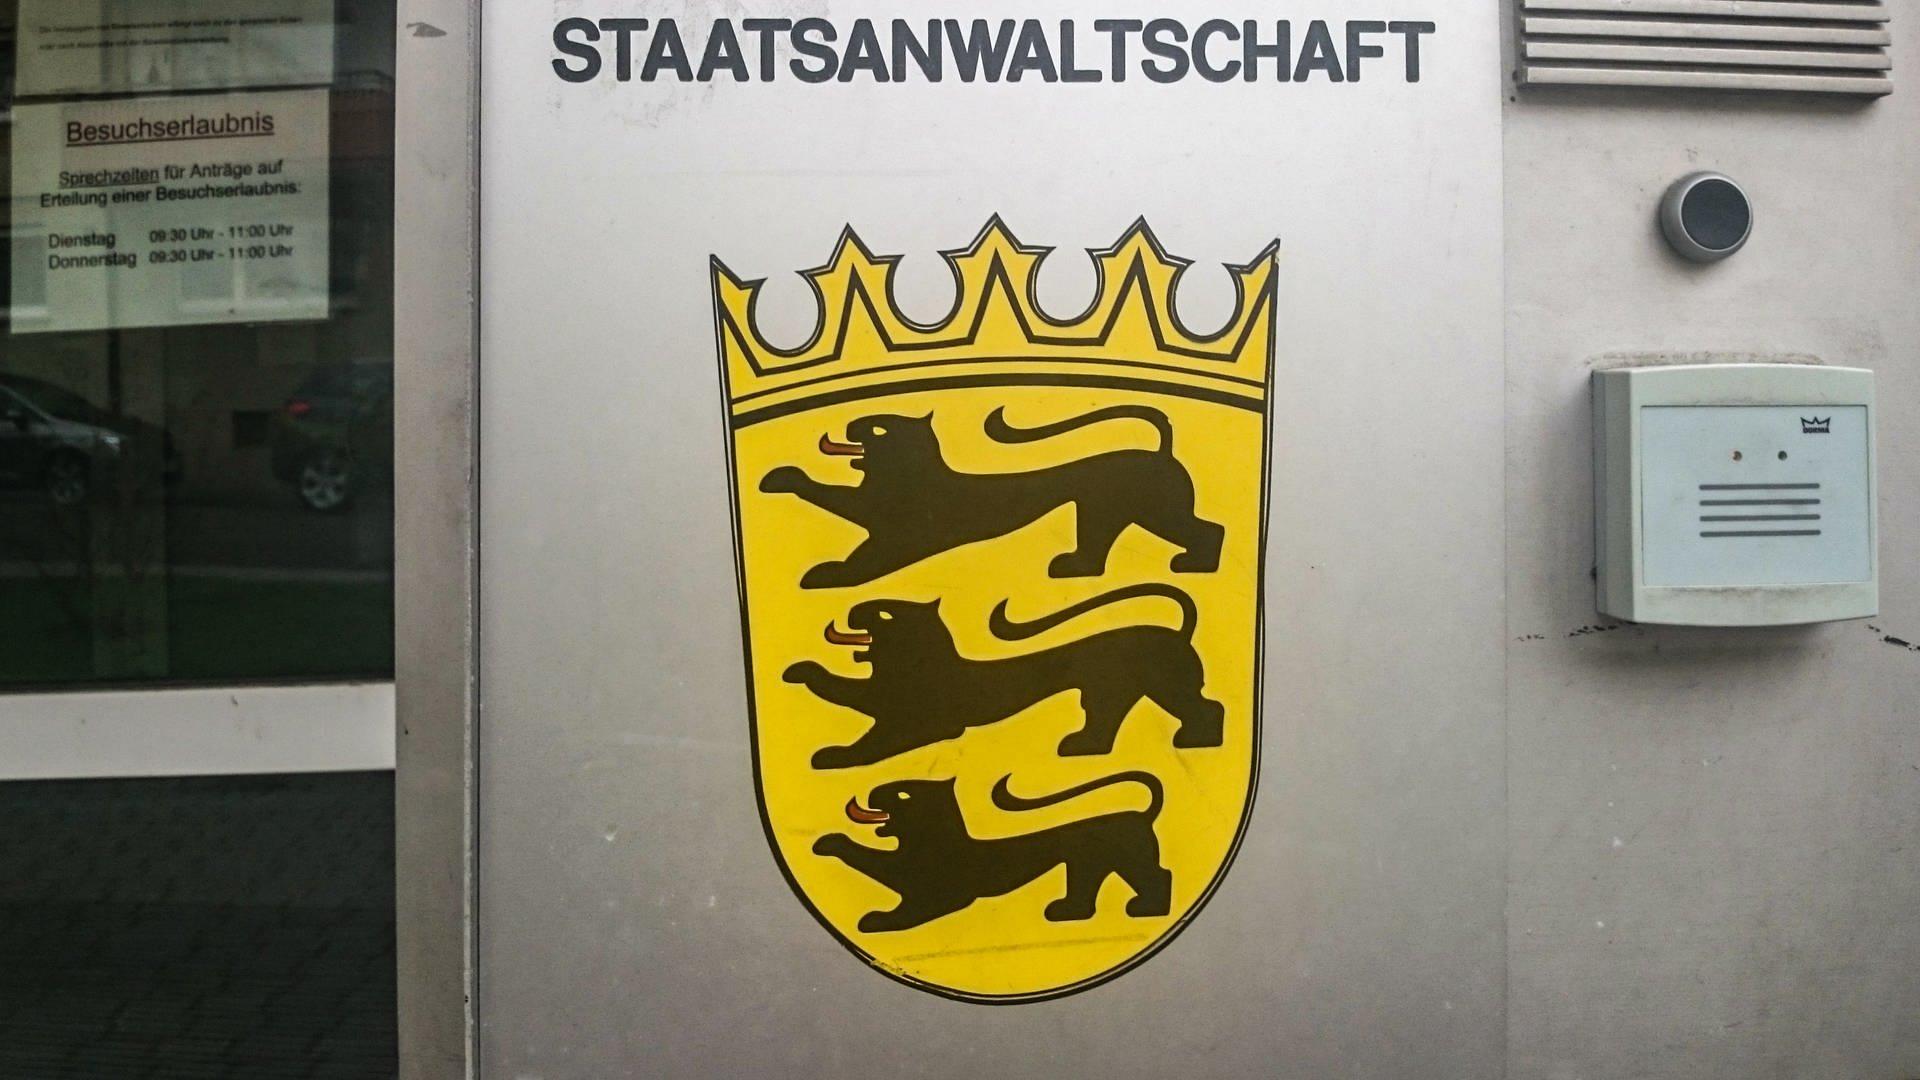 Staatsanwaltschaft - Symbolbild